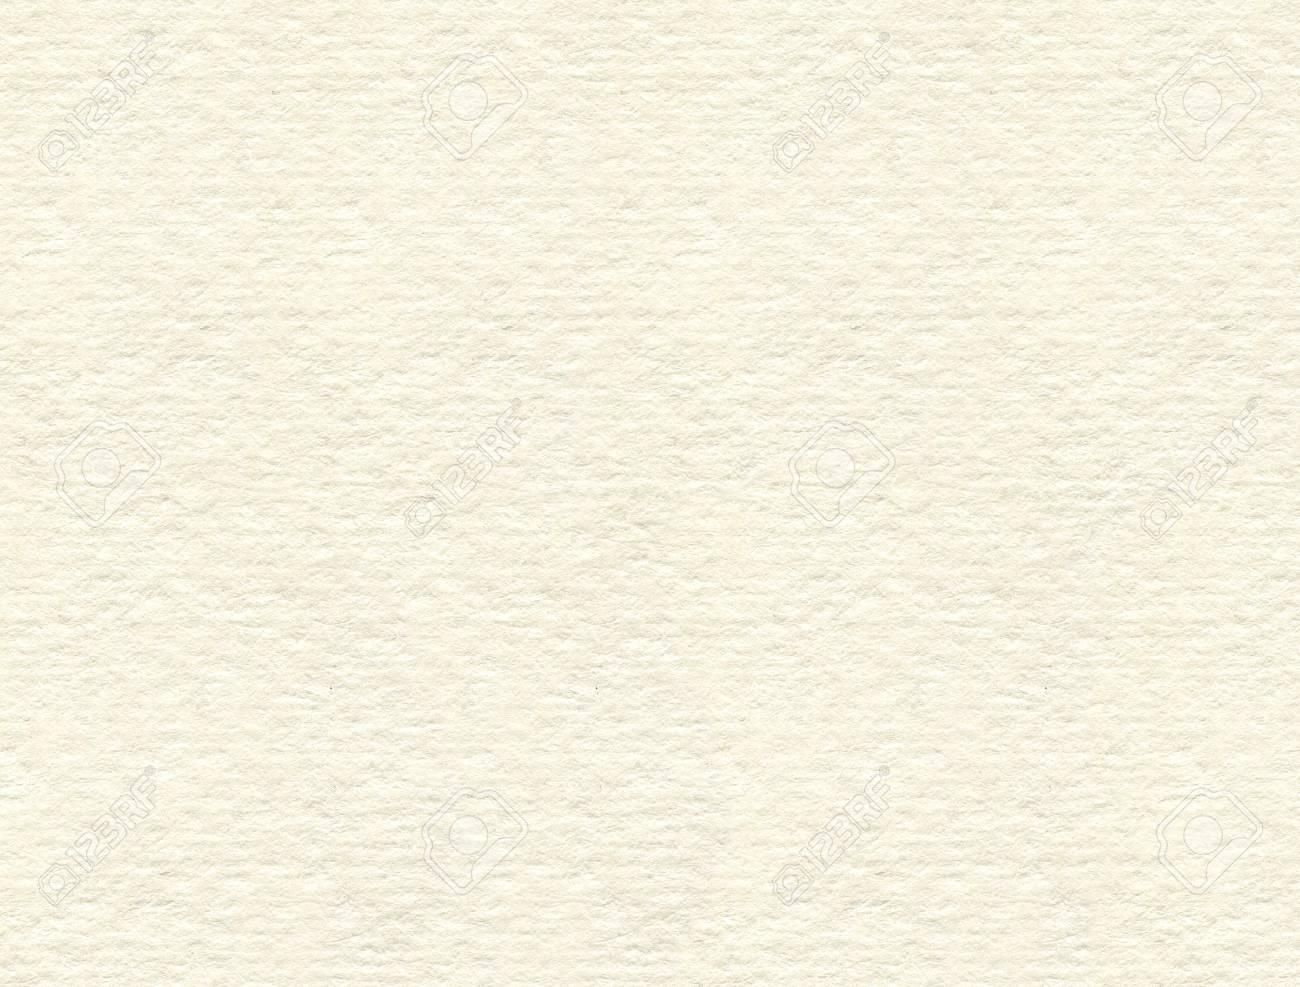 watercolor paper texture white